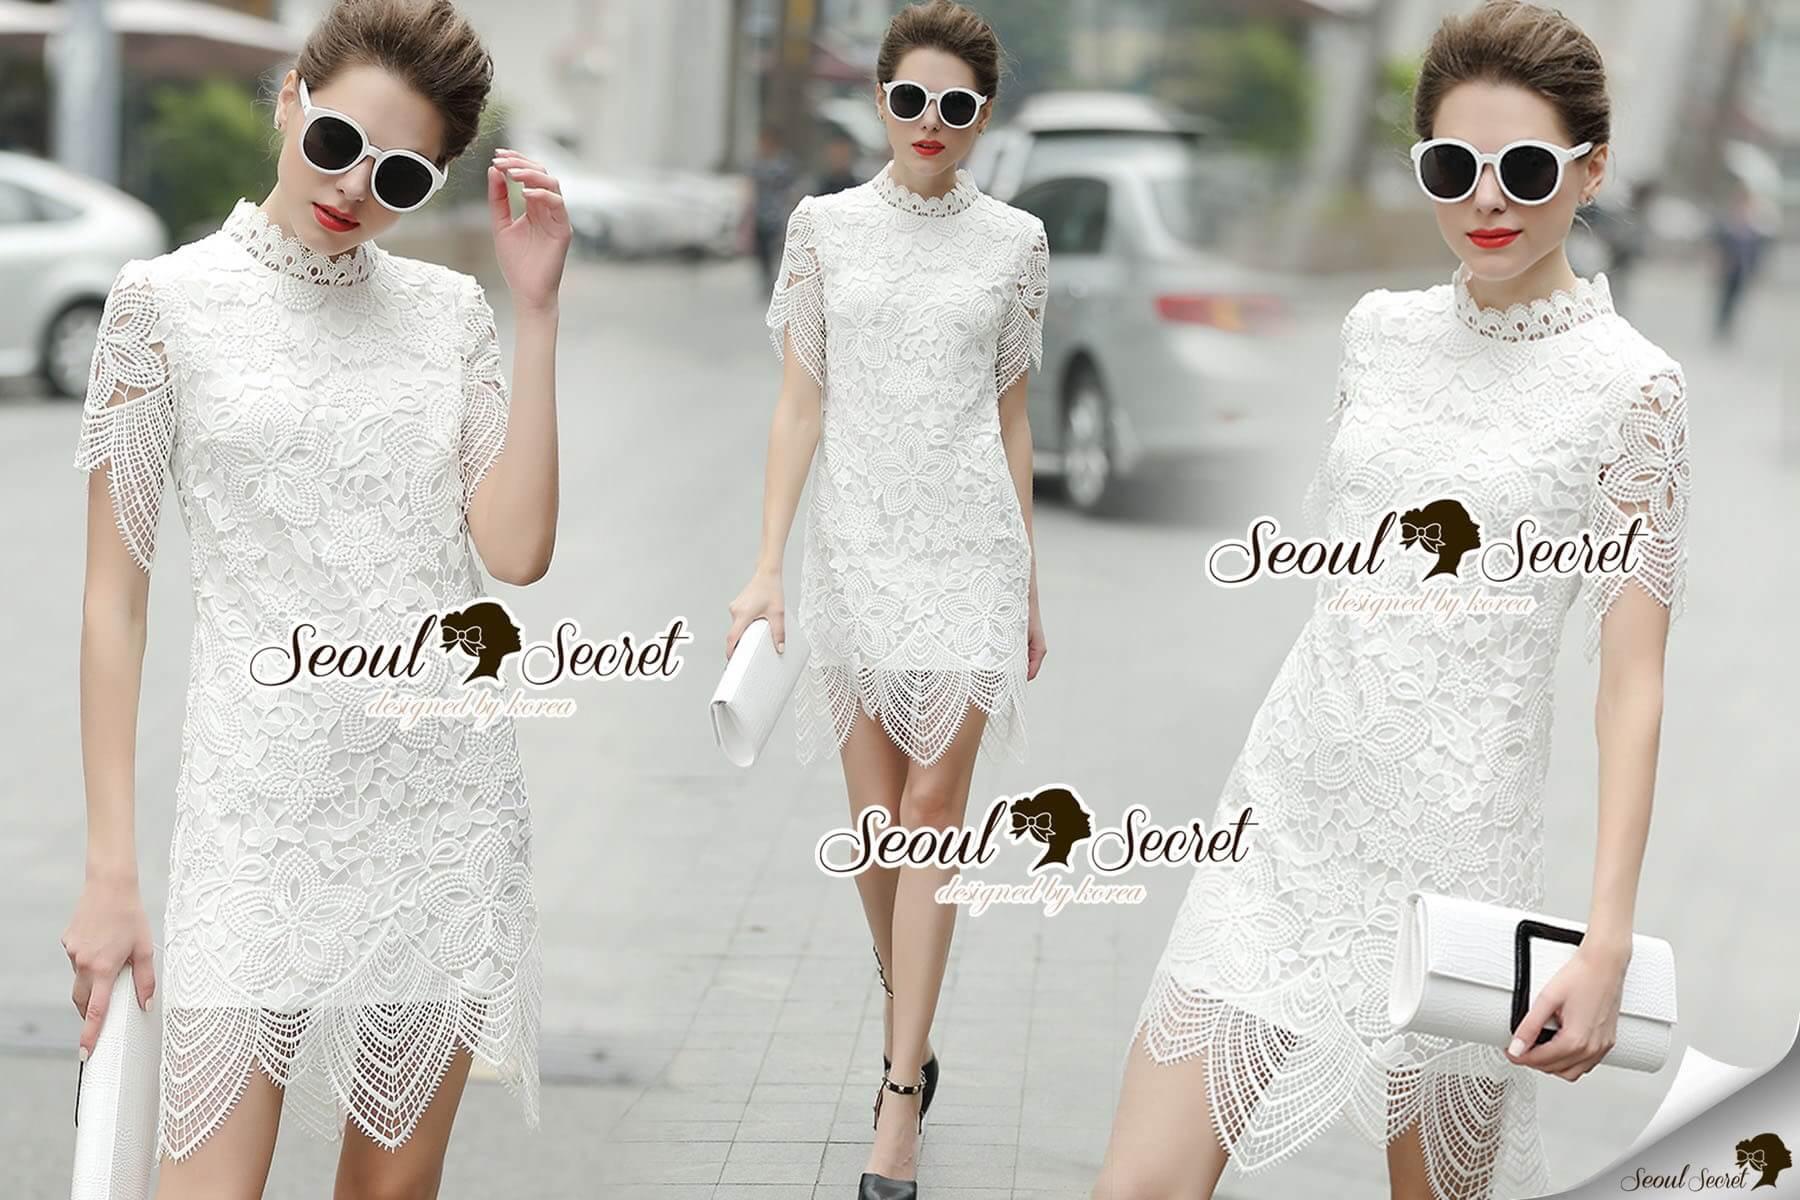 Seoul Secret Say's... Turtleneck Flora Ivory Lace Dress